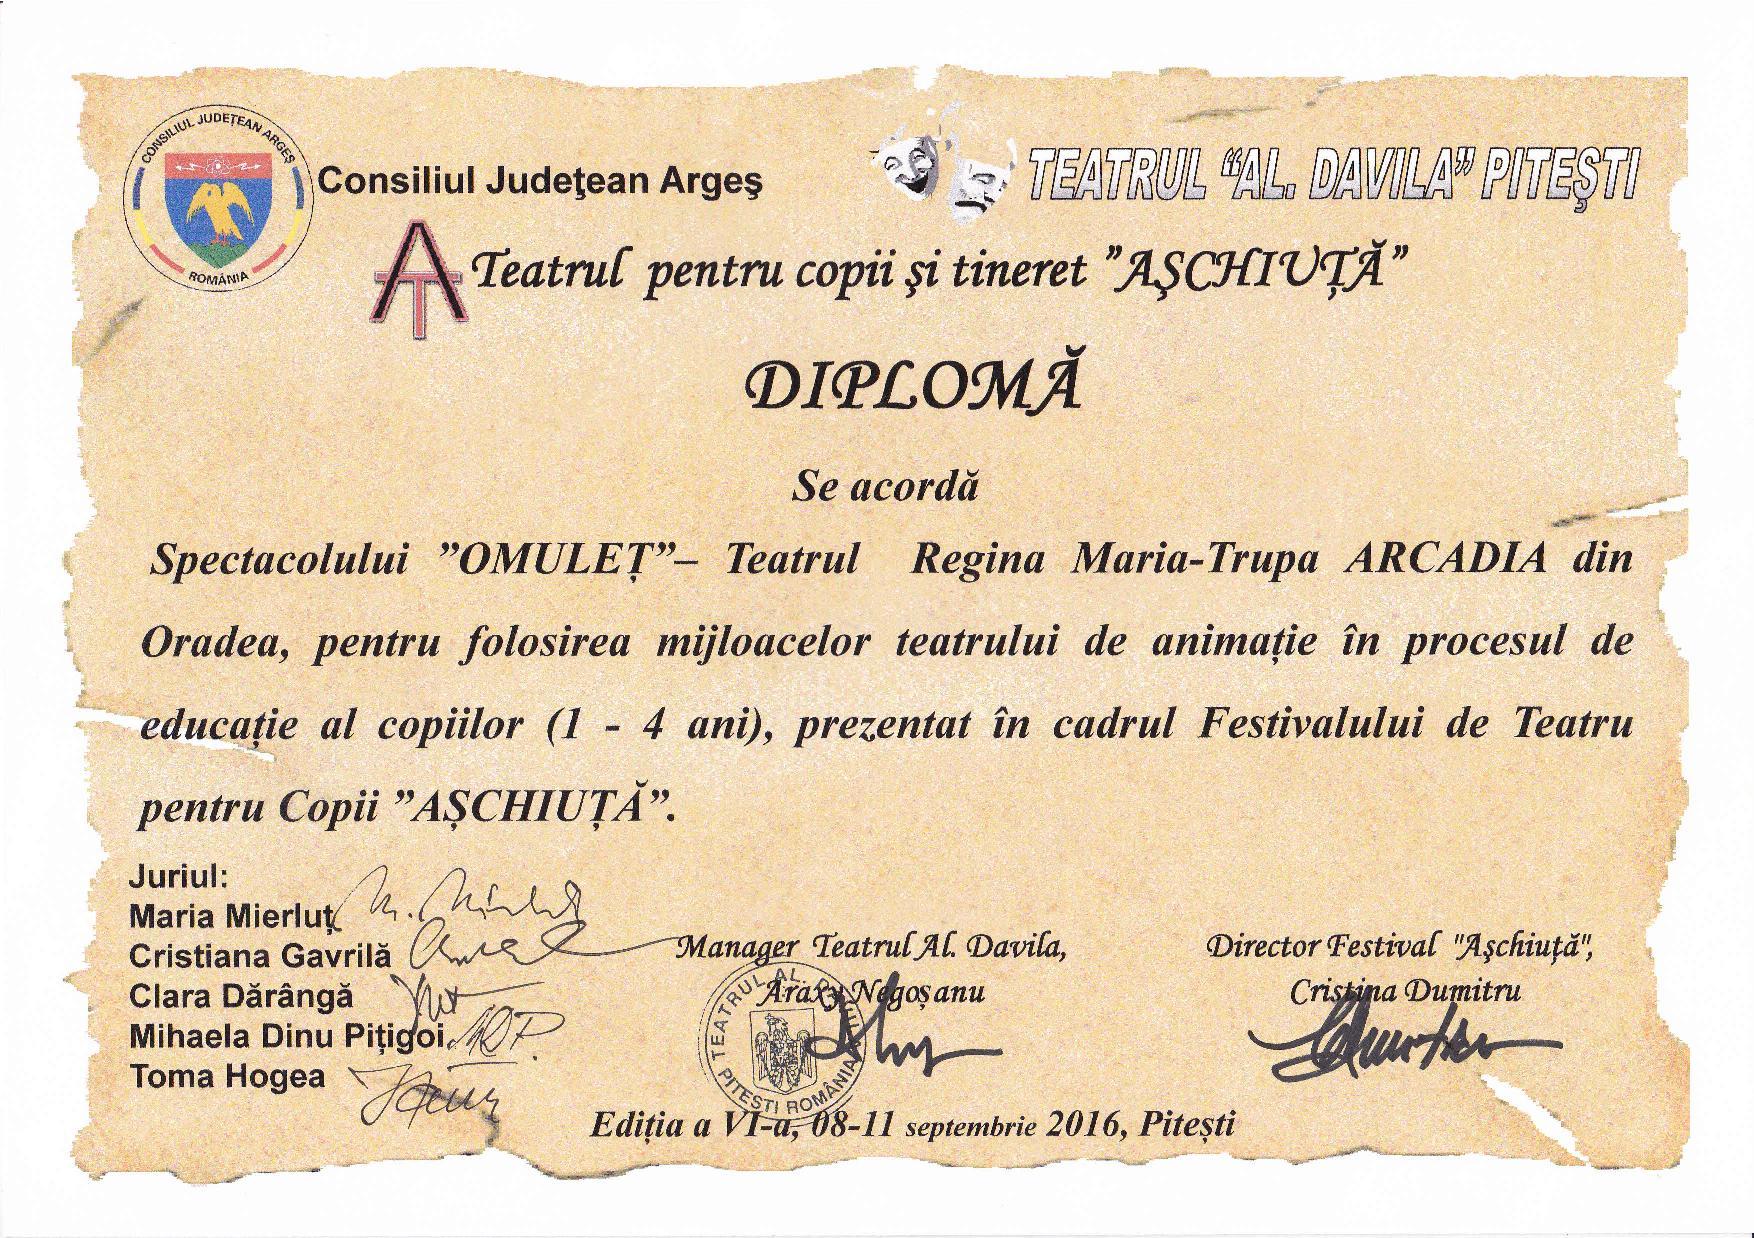 Diploma-spect-OMULET-Festivalul-Aschiuta-Pitesti-2016